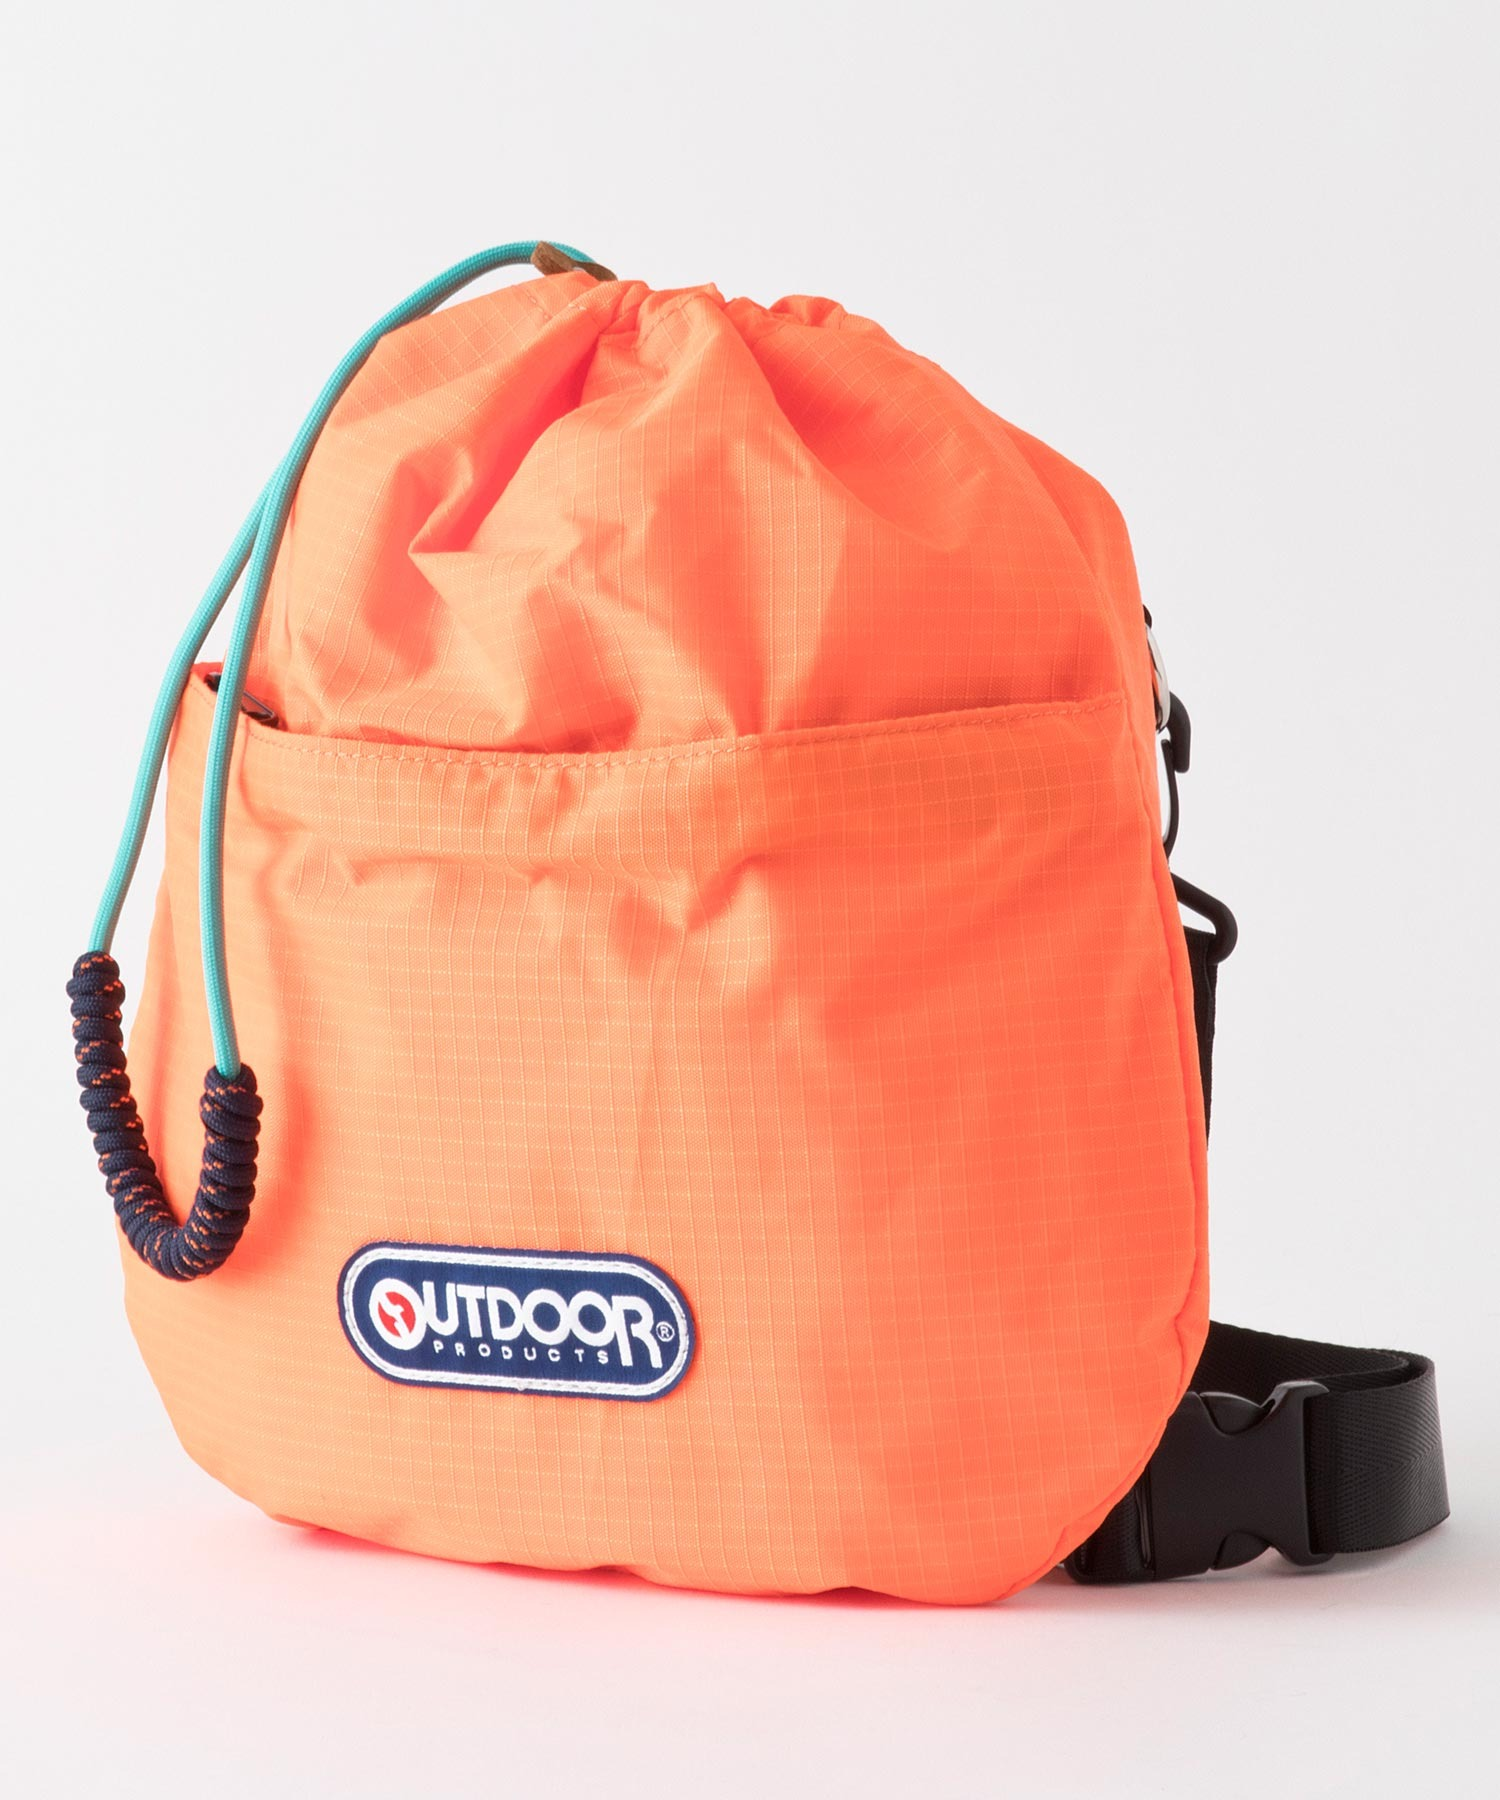 ENCANTO SHOULDER 111103 巾着バッグ ショルダーバッグ ブランドロゴ